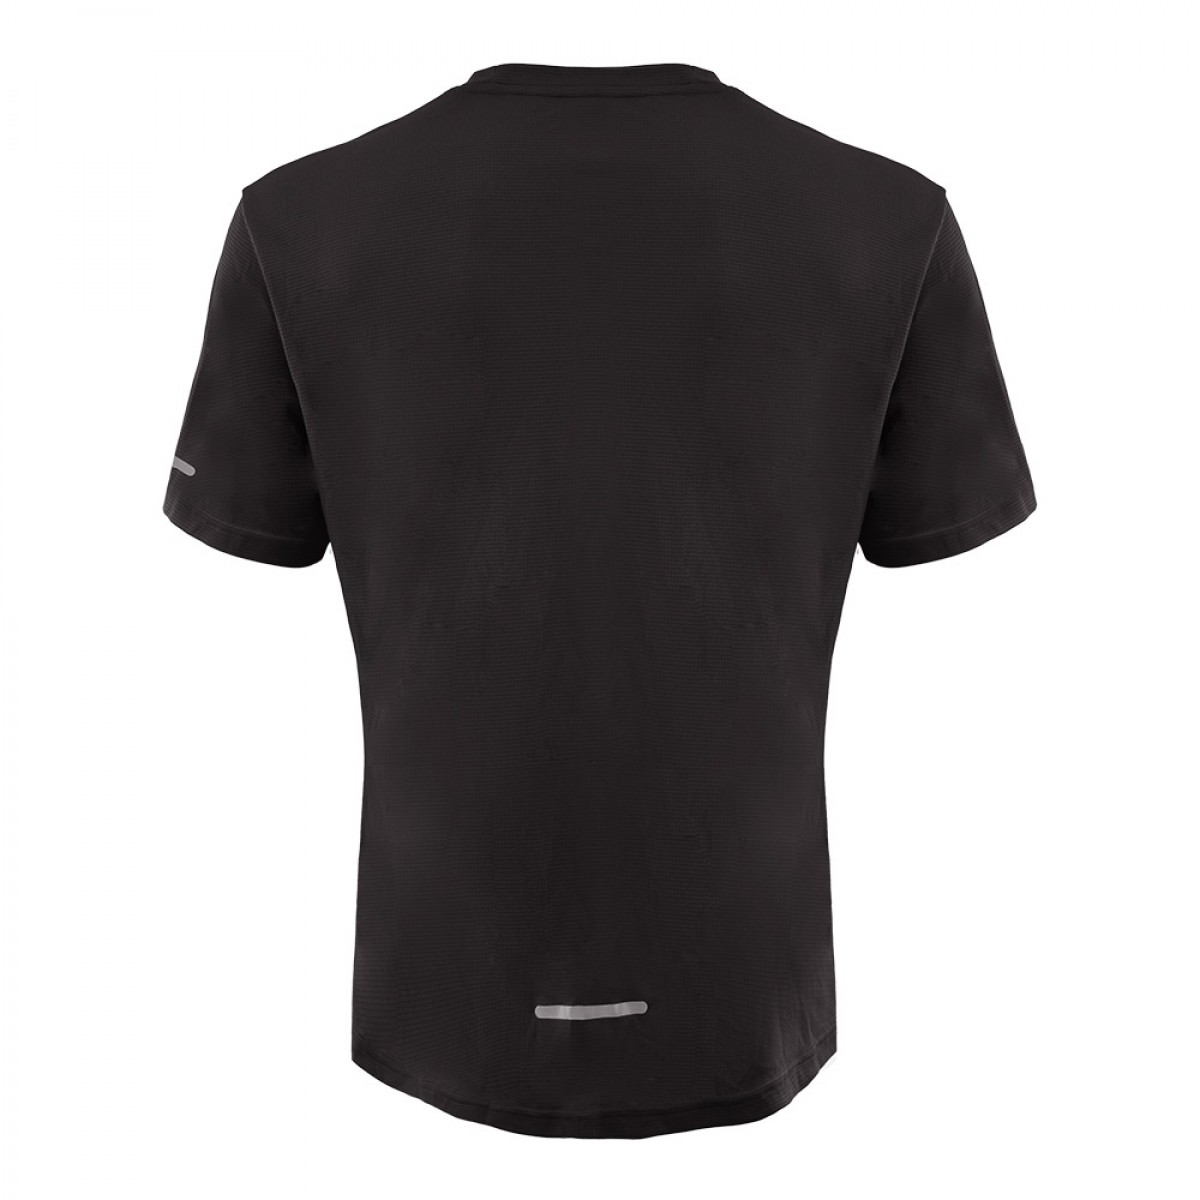 men-knitted-round-neck-logo-t-shirt-kkrnlt15935-10a